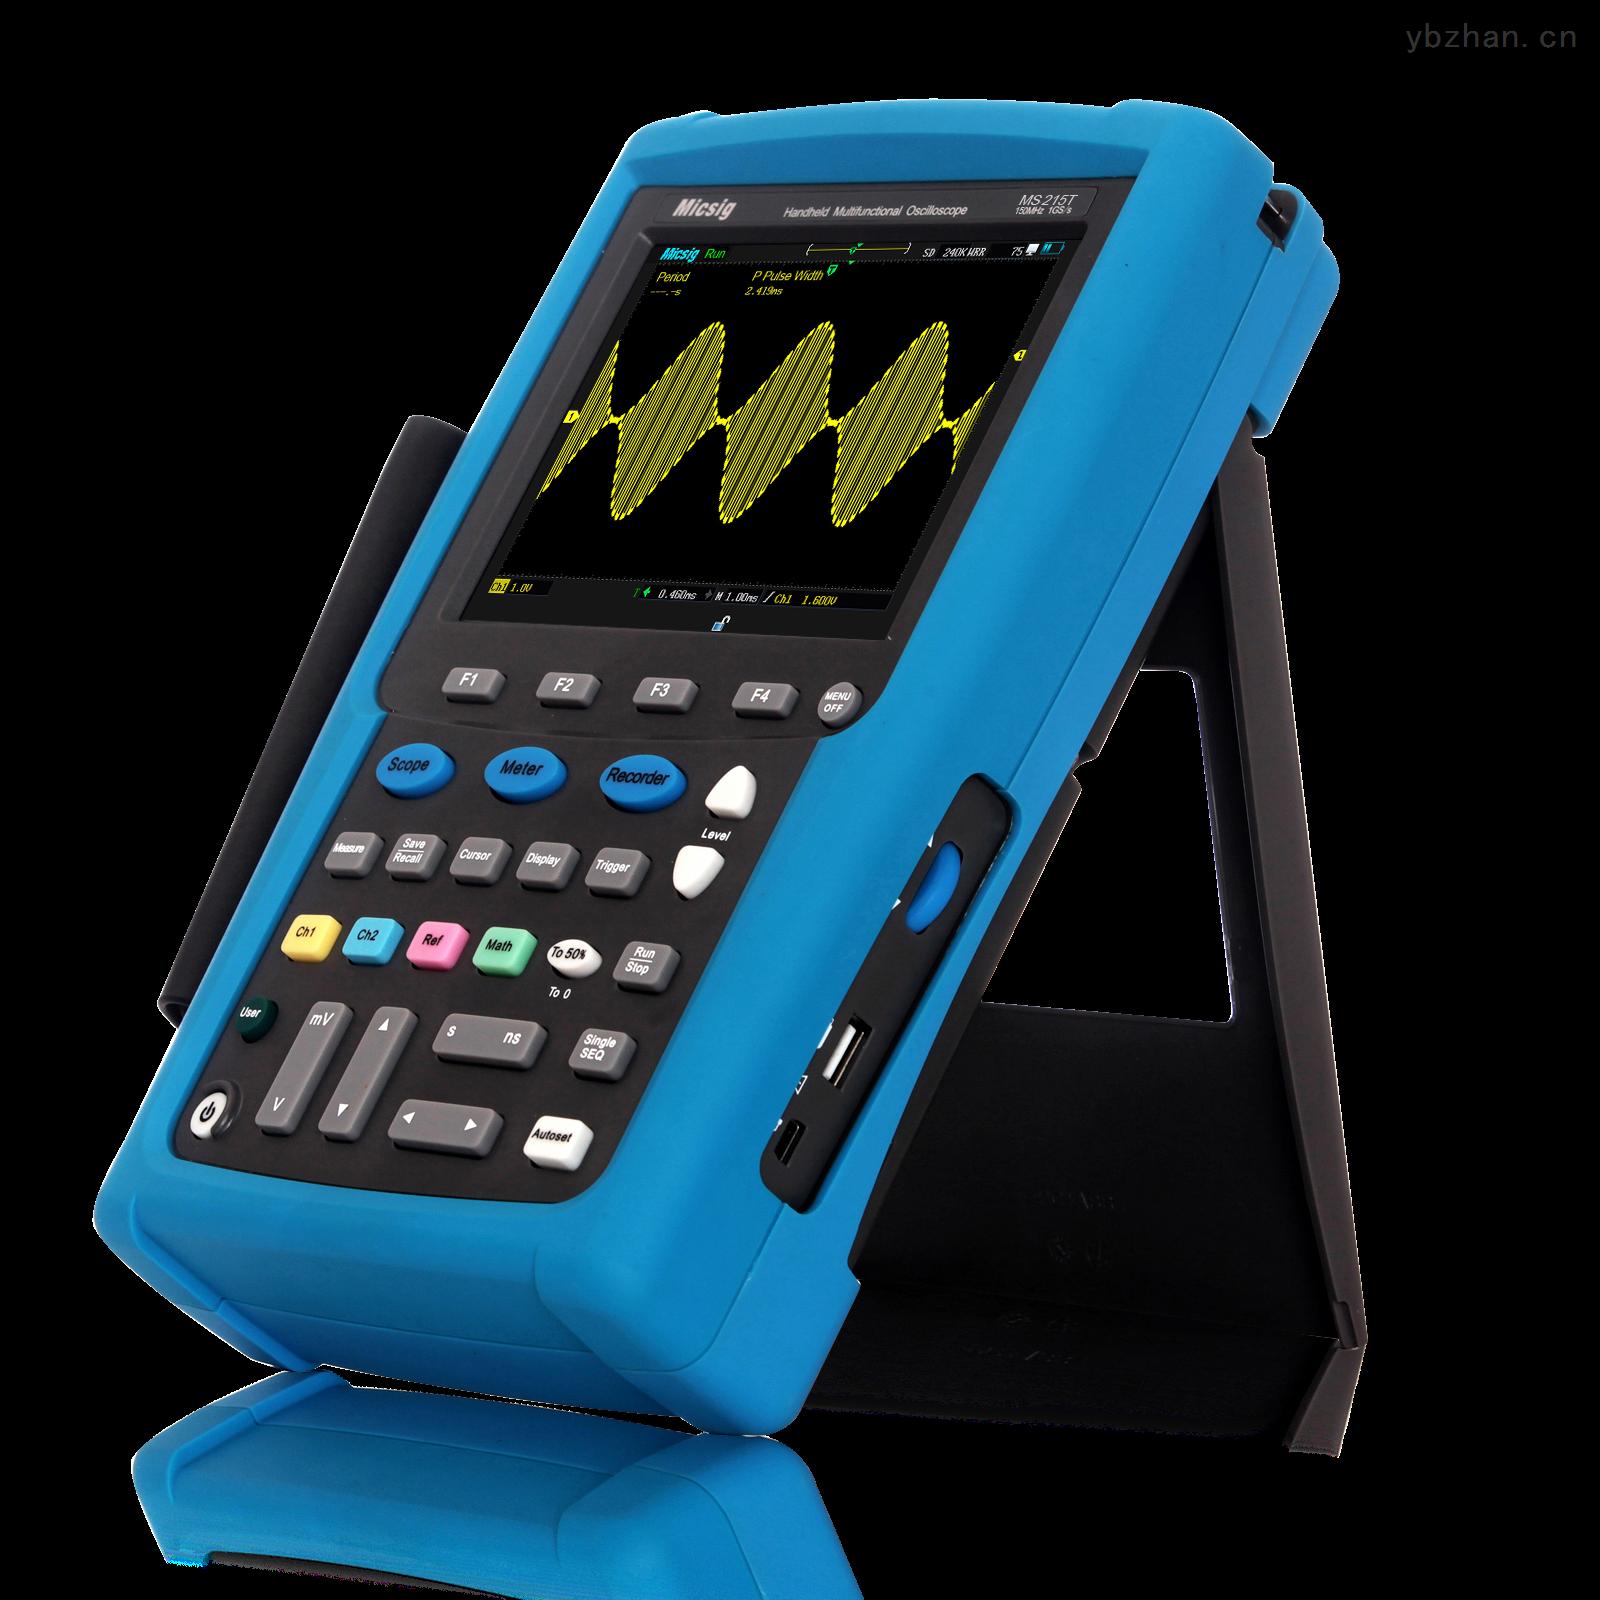 MS215T-麦科信手持示波器MS215T